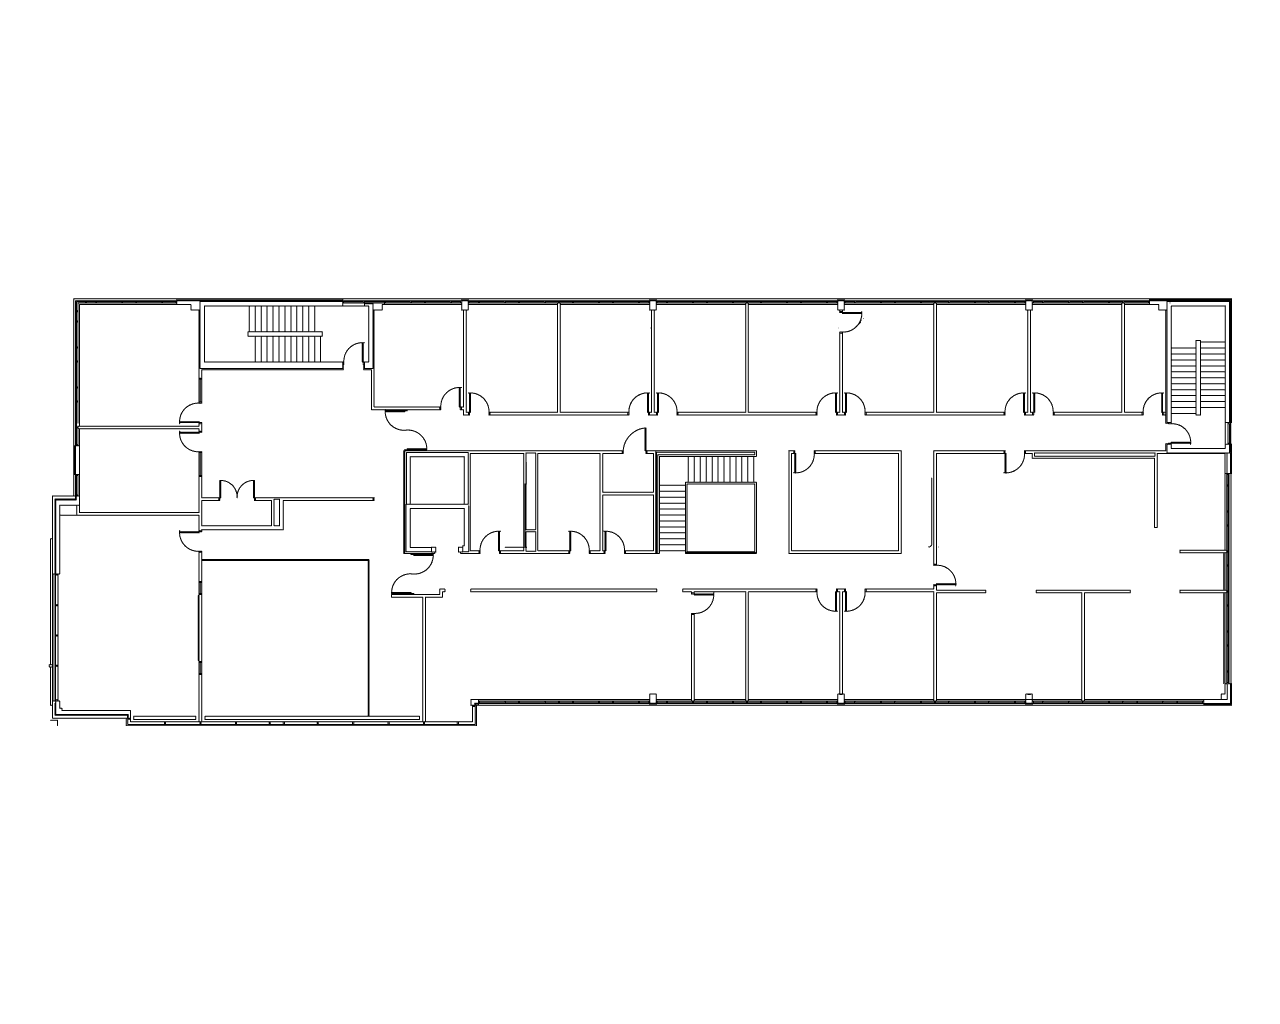 2D-Floo-Plan-QAG31